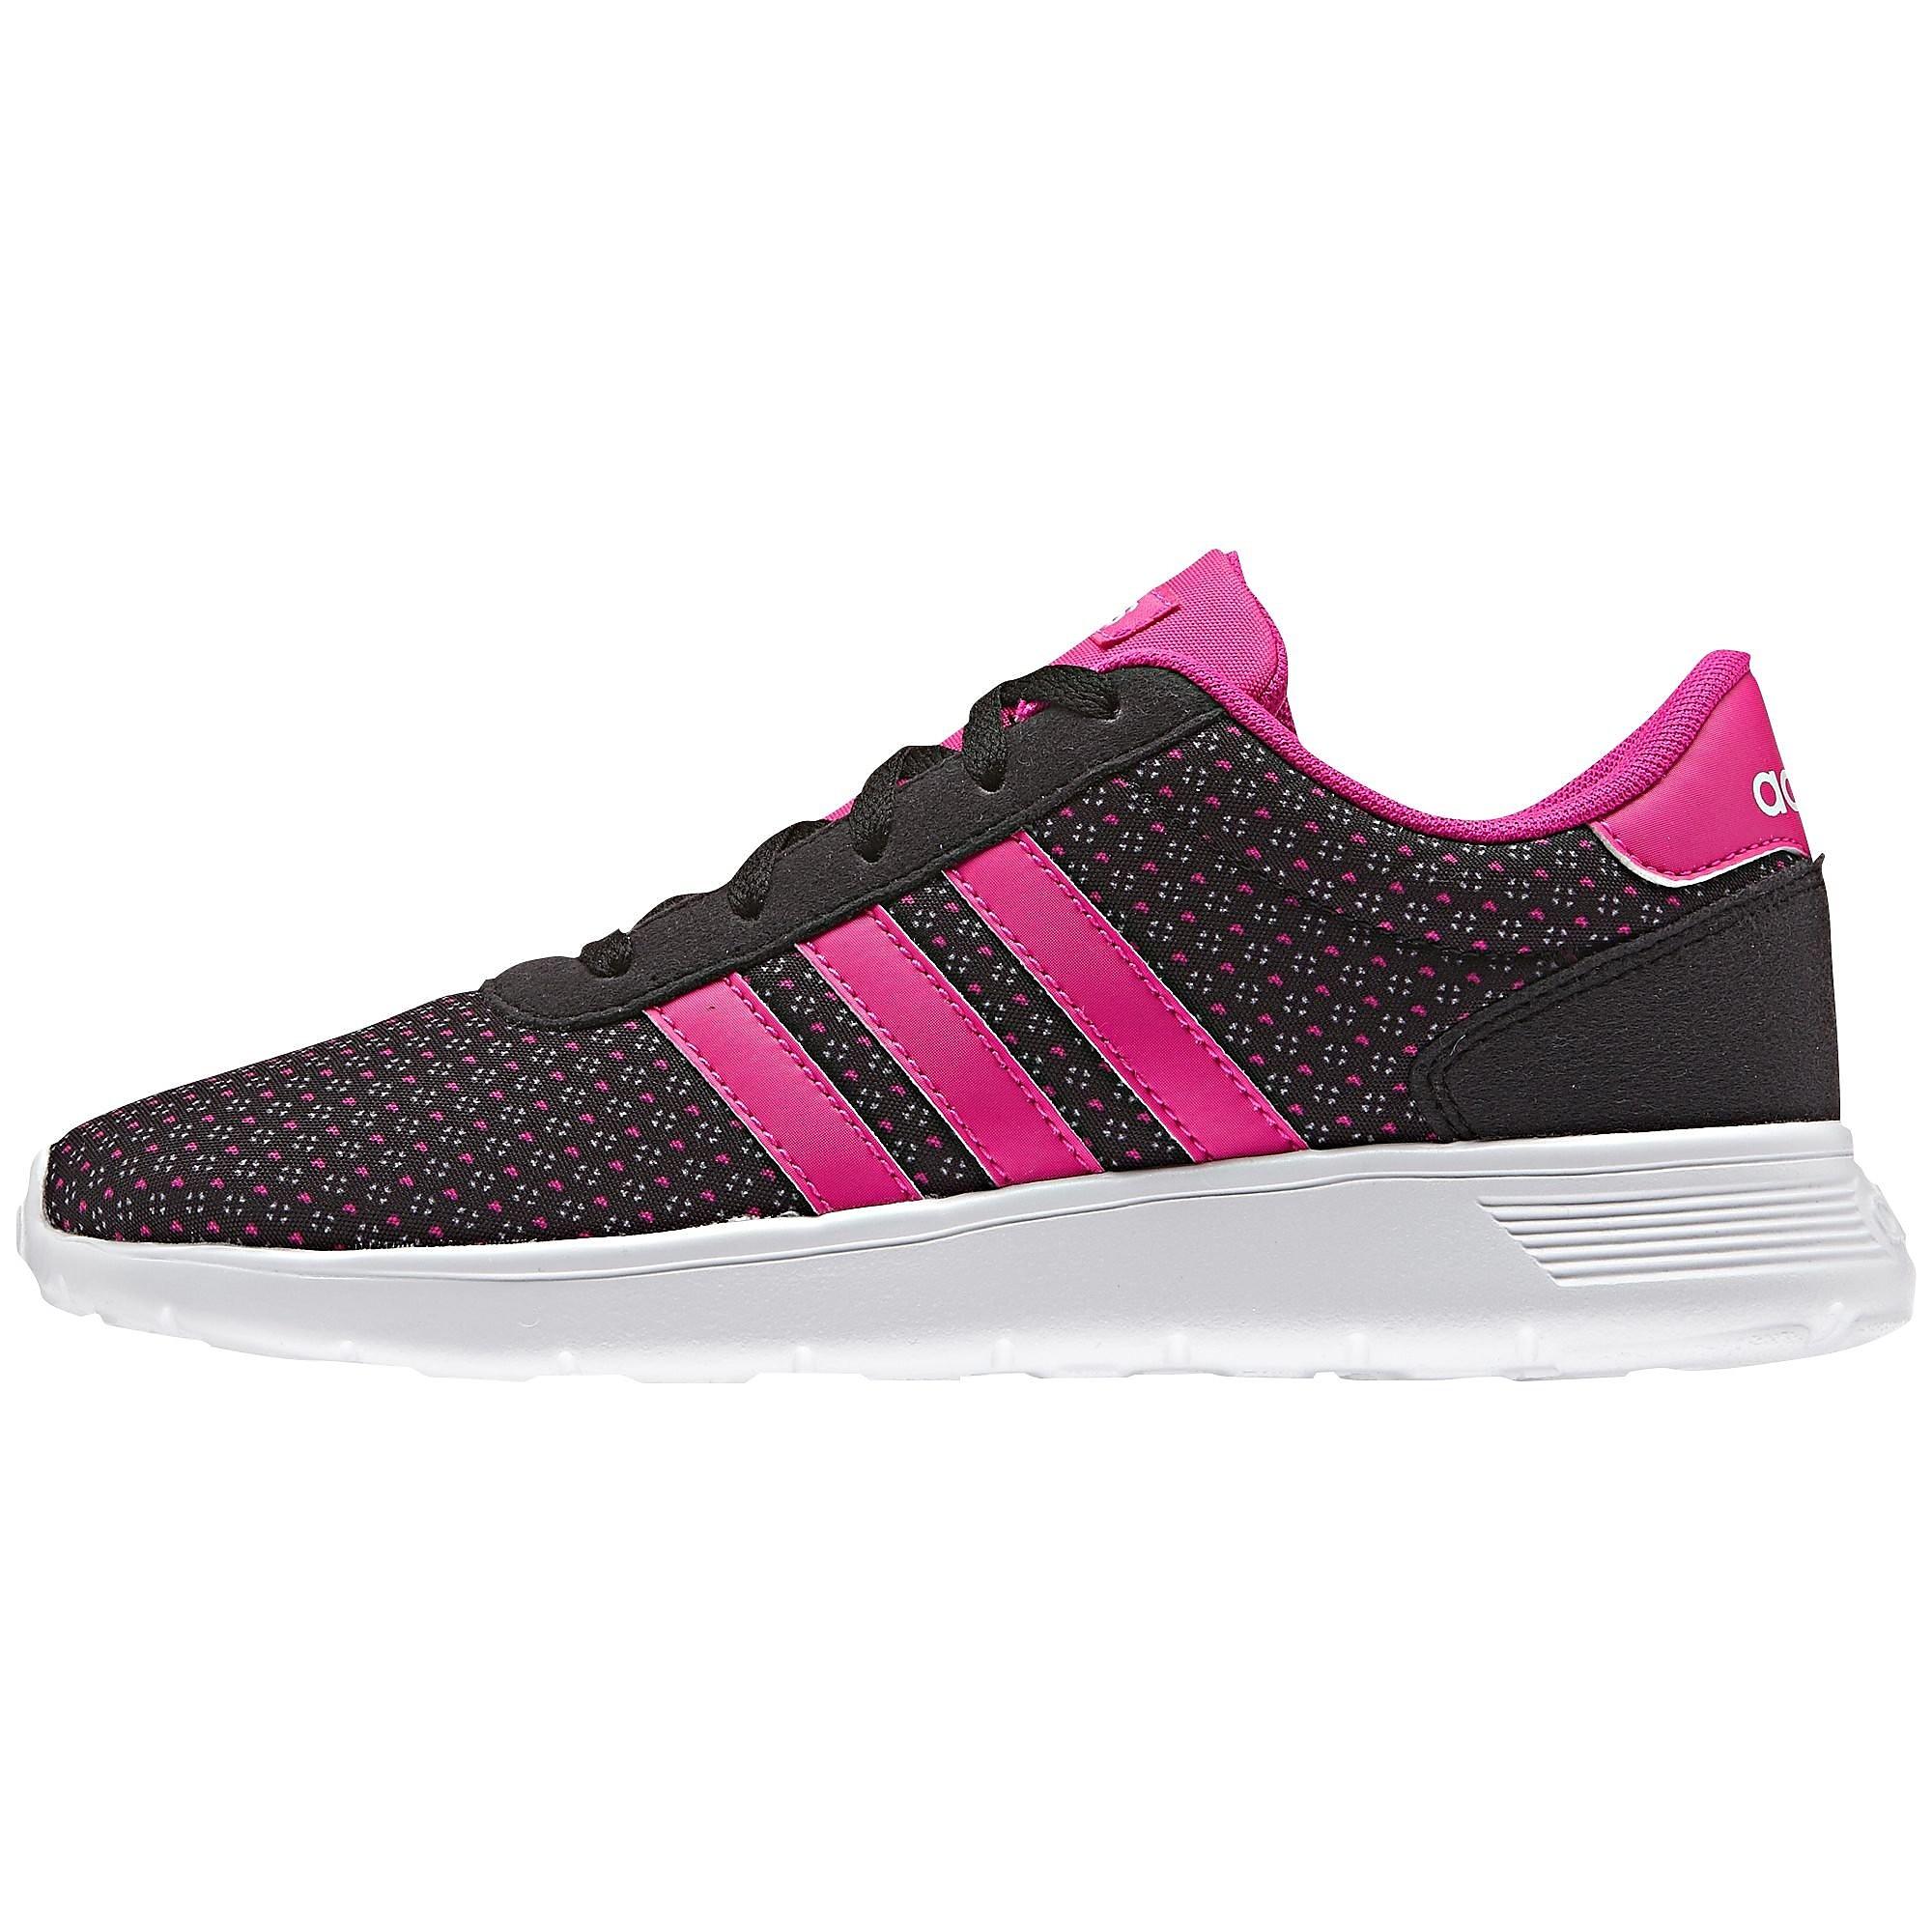 Sportschoenen adidas AW5122